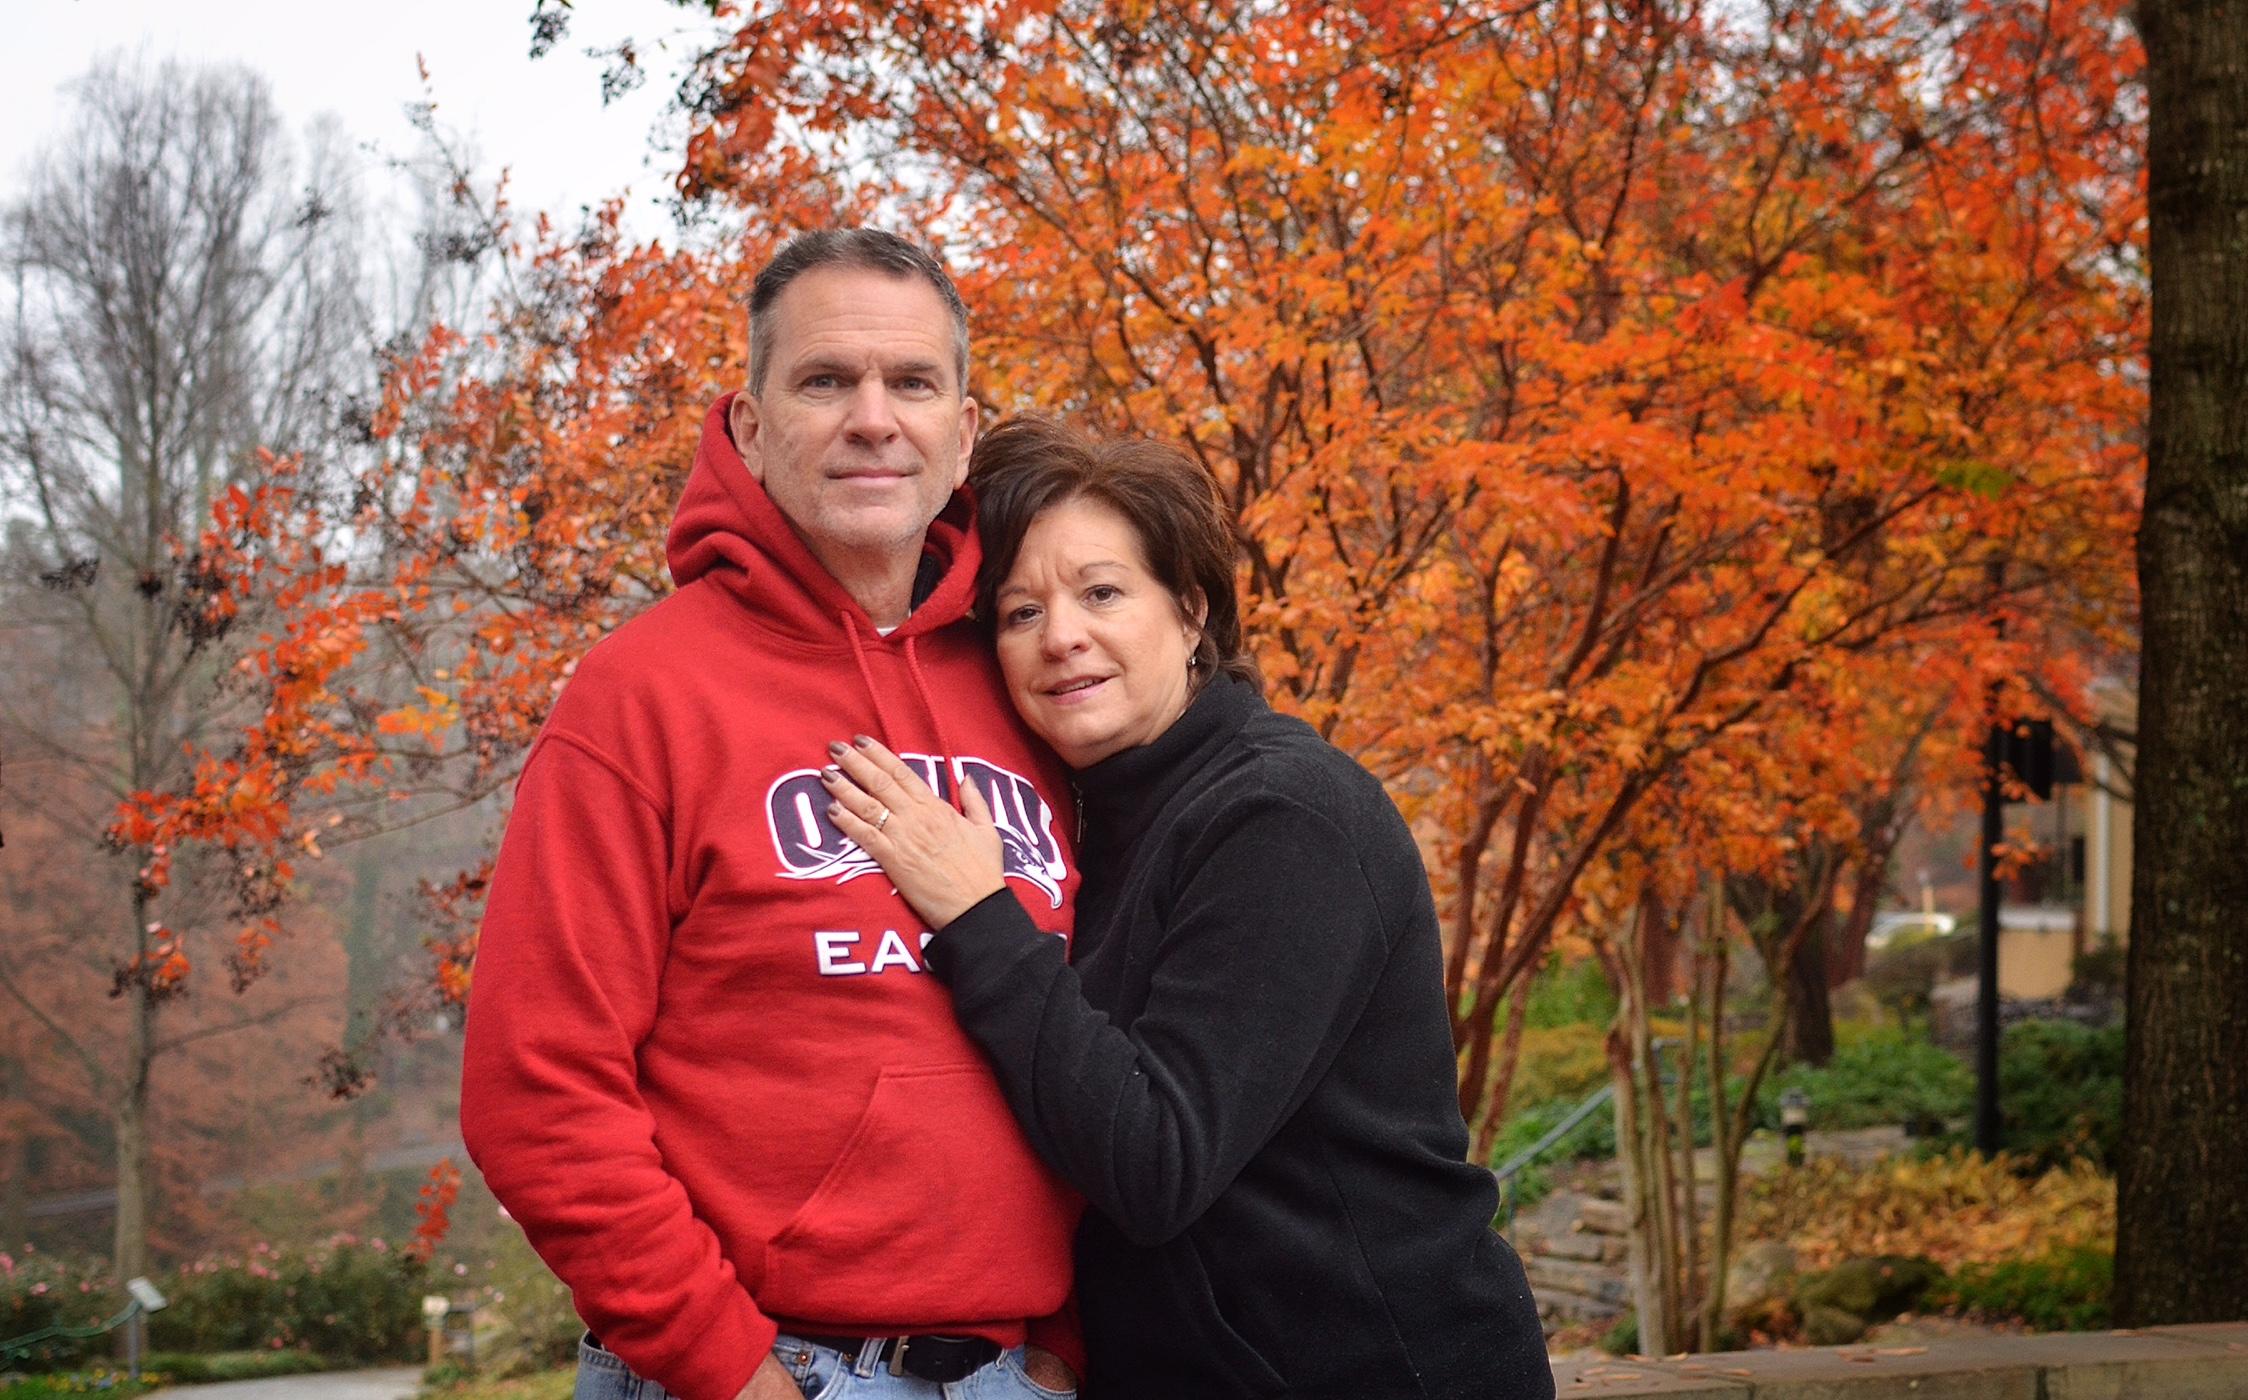 Bob and Gail Buse